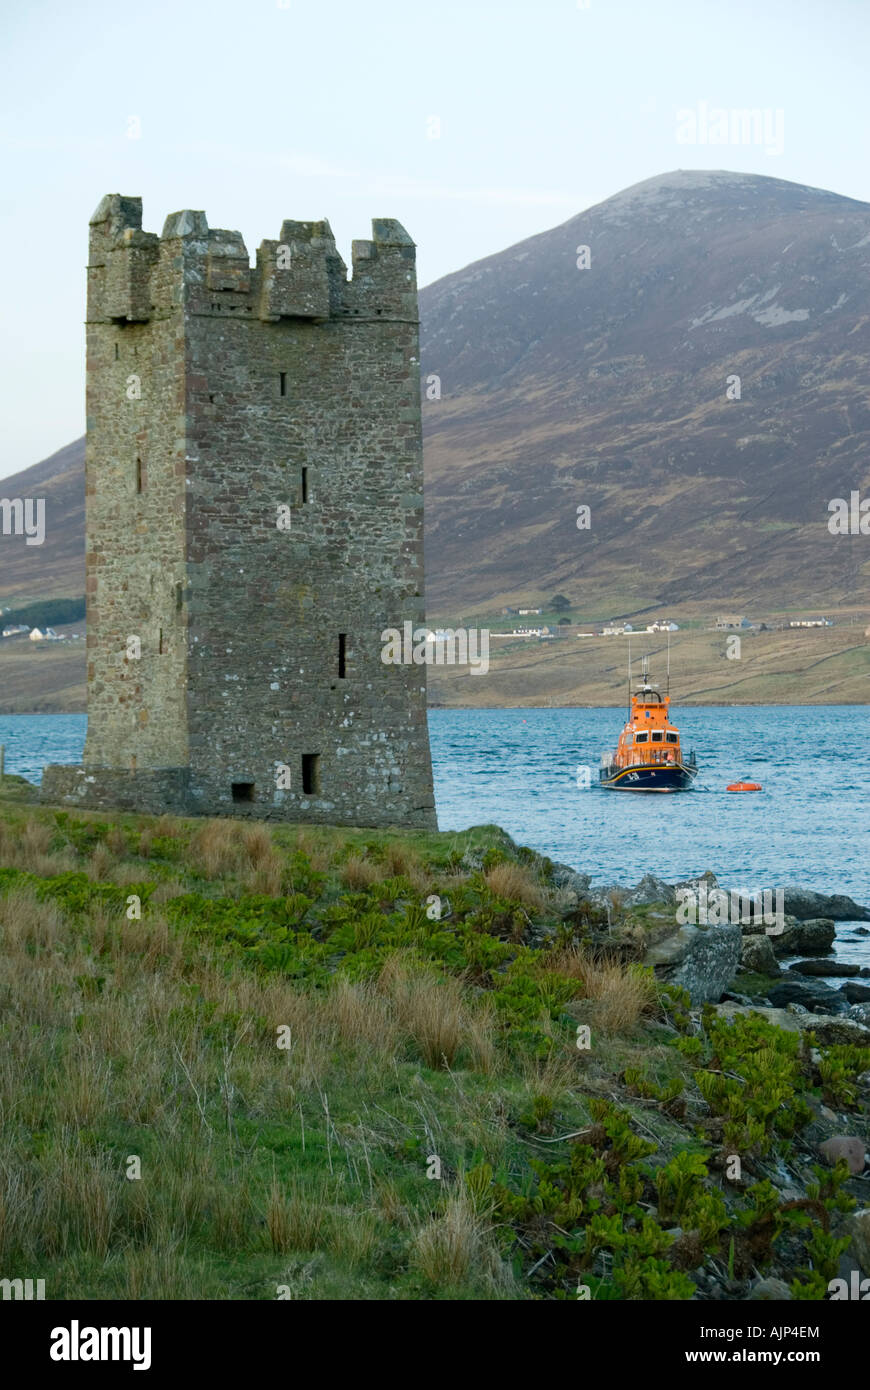 Carrick Kildavnet Castle and Corraun Hill, Achill Island, County Mayo, Ireland - Stock Image